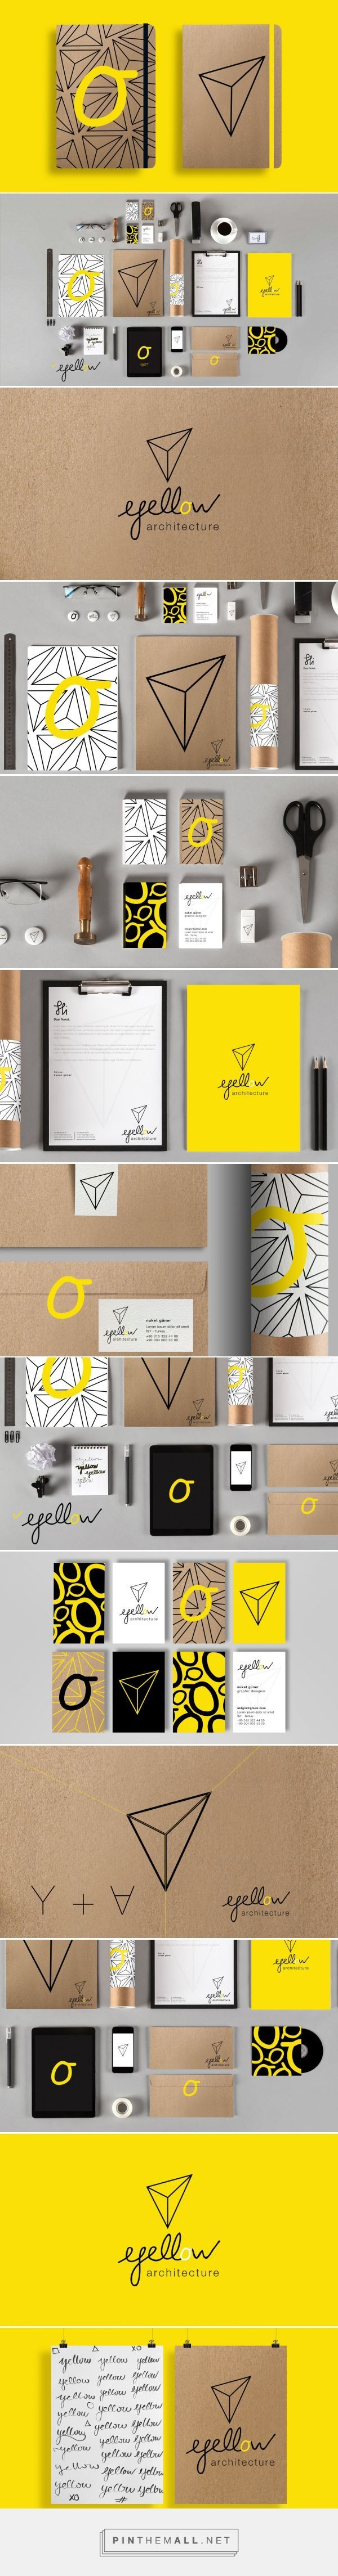 branding inspiration black & white + amarelo + craft formas geométricas